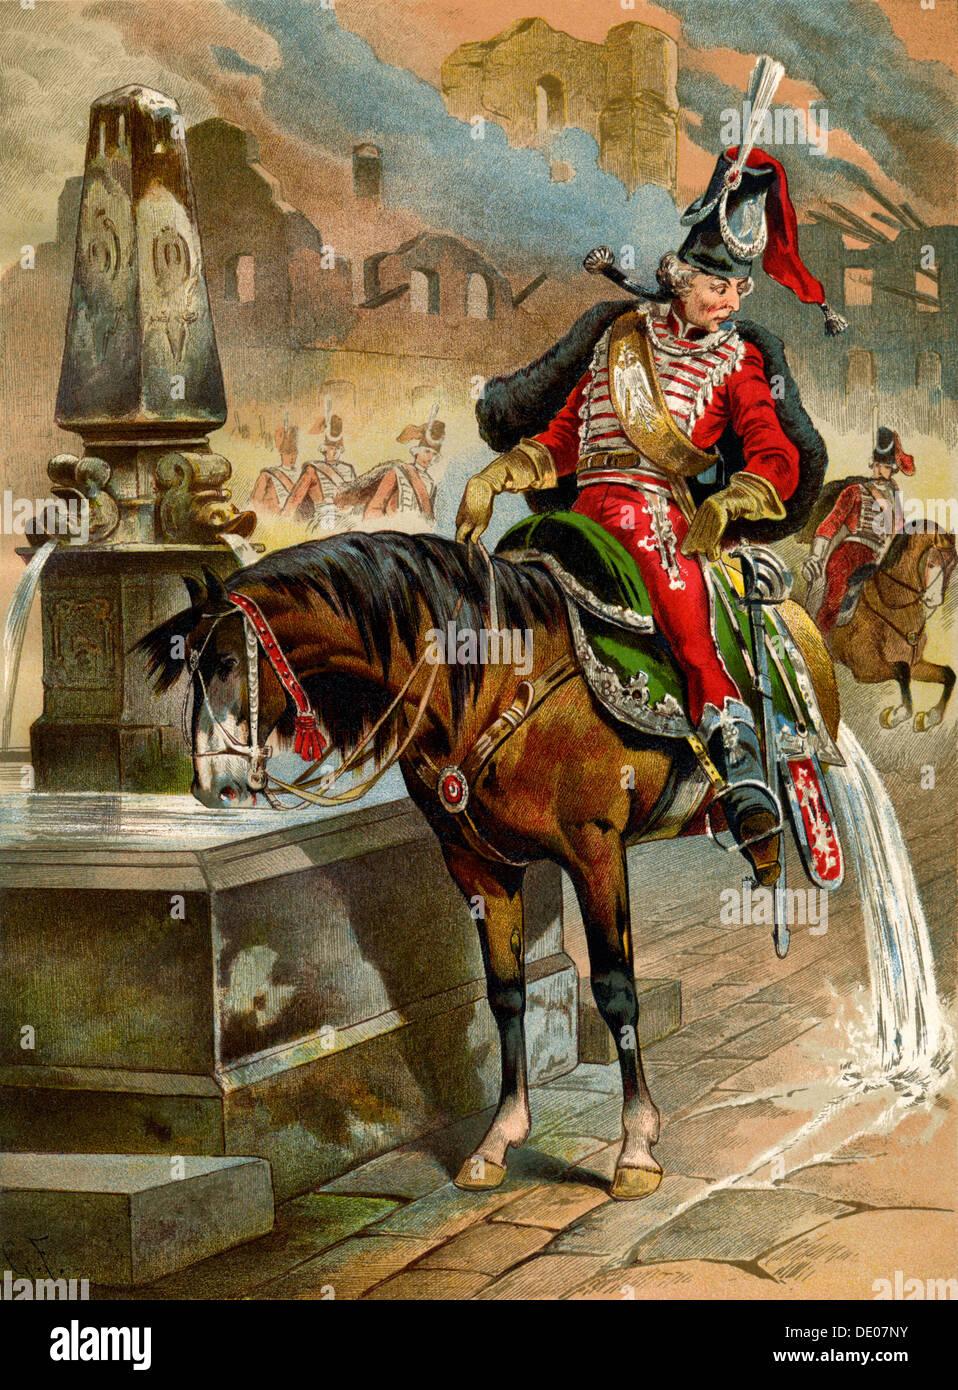 Book illustration, 1896.  Artist: Franz Gottfried - Stock Image